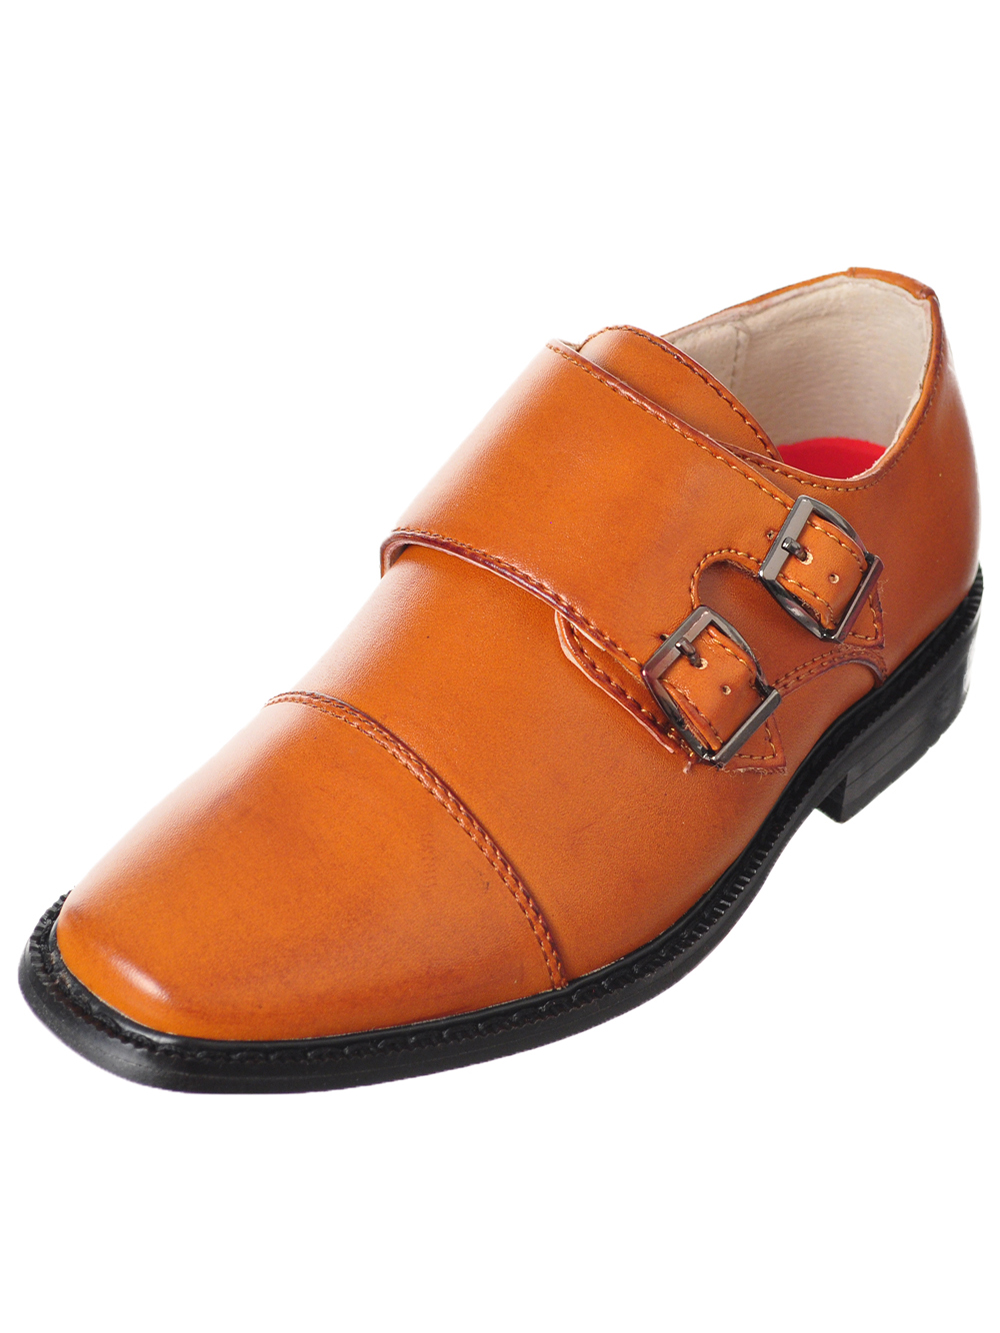 Boys Dress Shoes (Toddler Sizes 9 - 12)